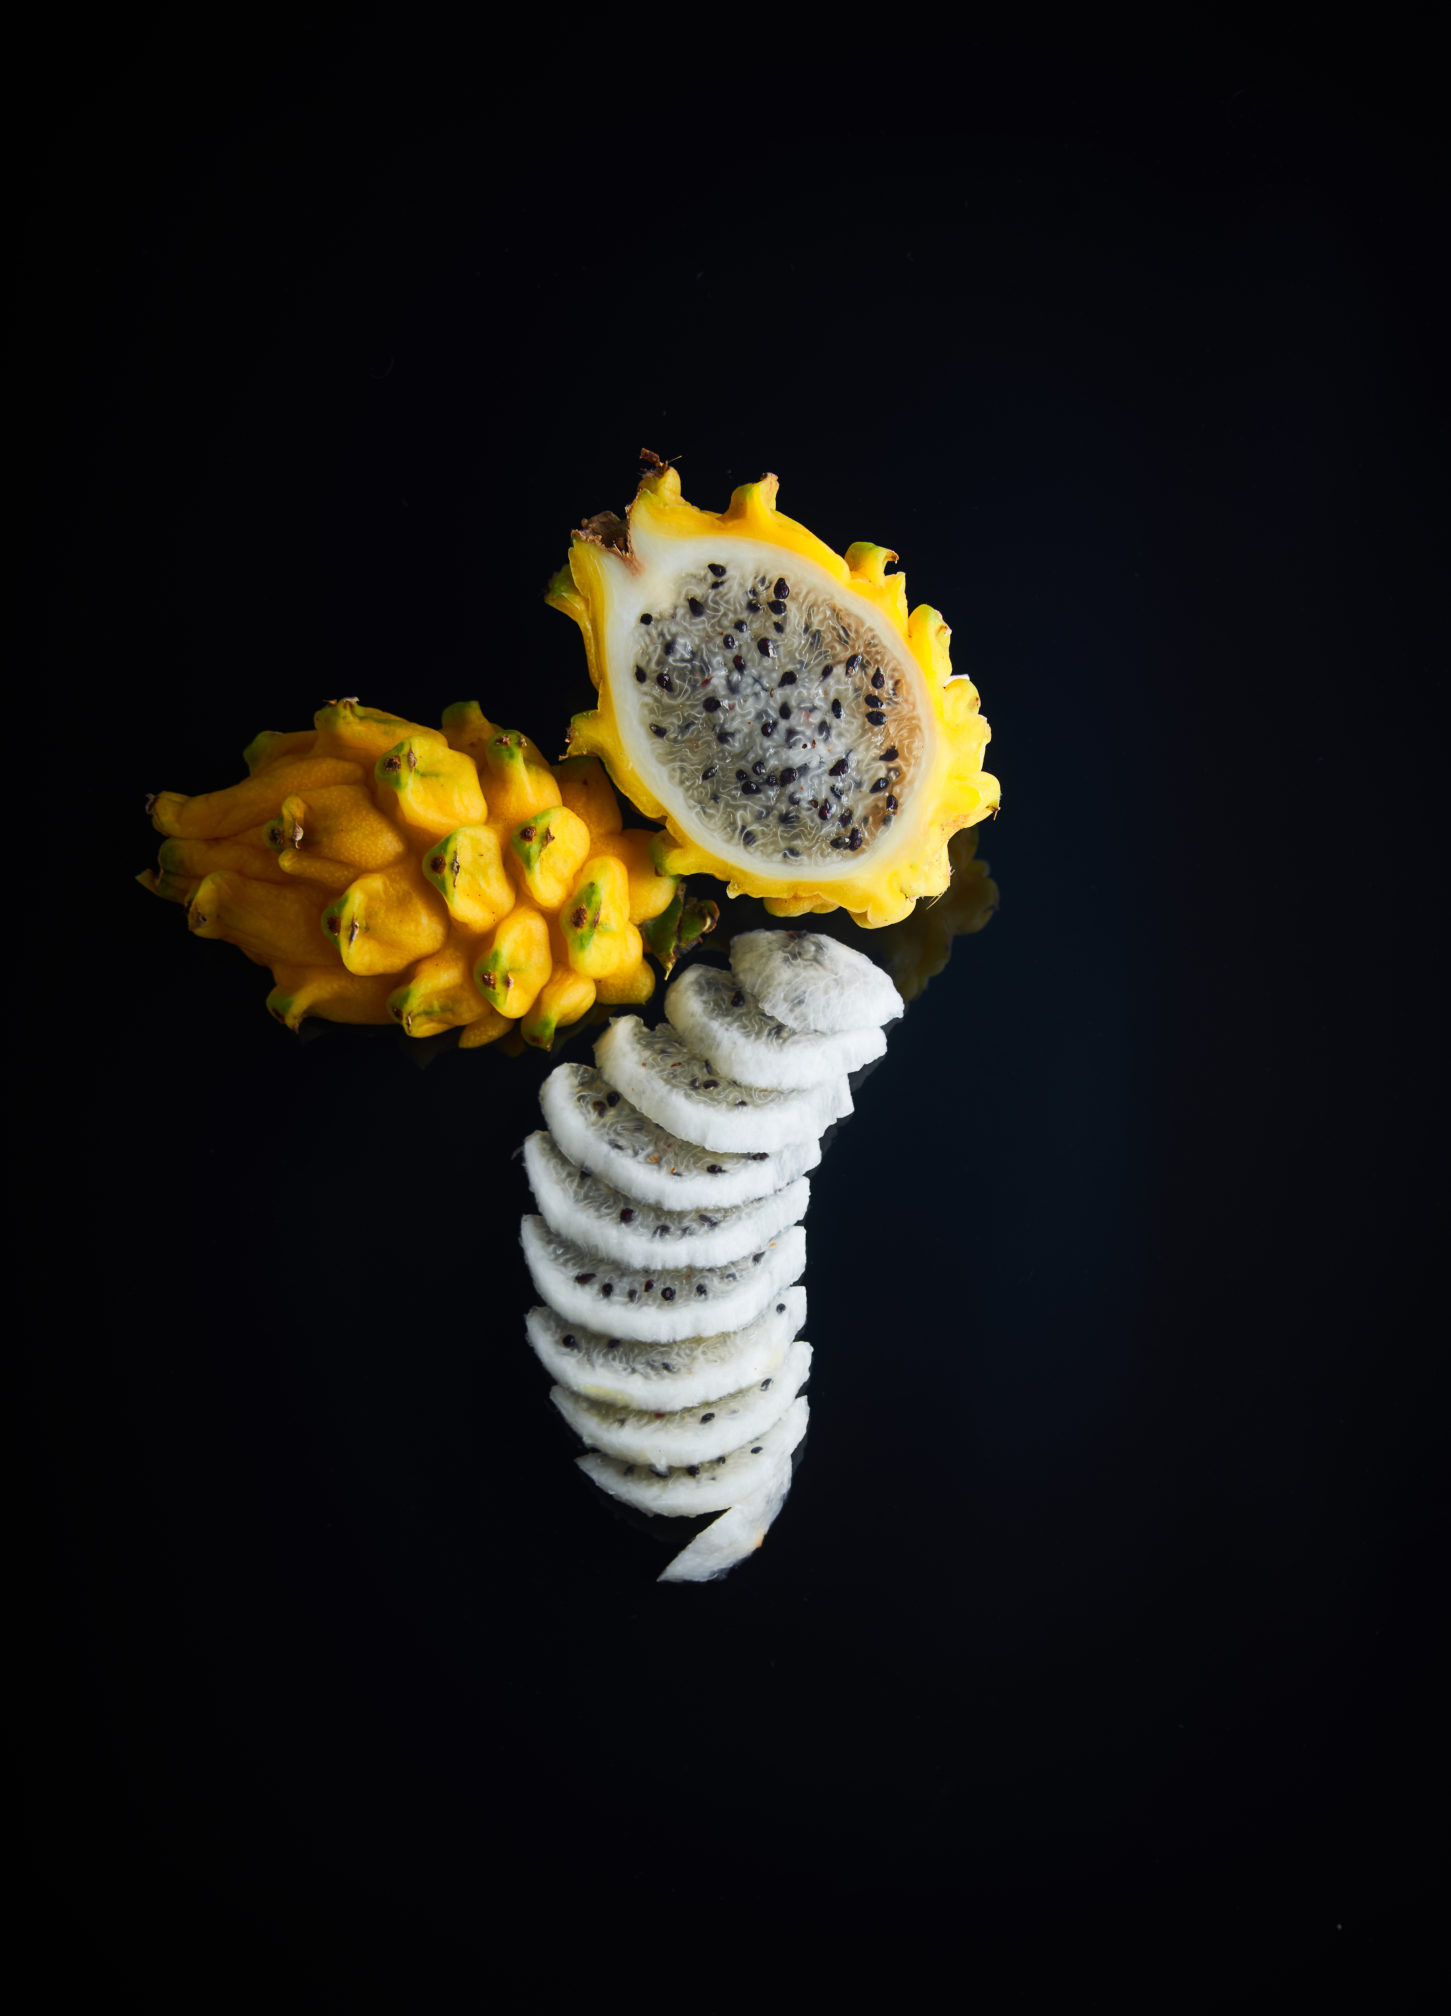 capexo-lilot-fruits-exotique-pitahaya-jaune-Colombie-Equateur-Israël